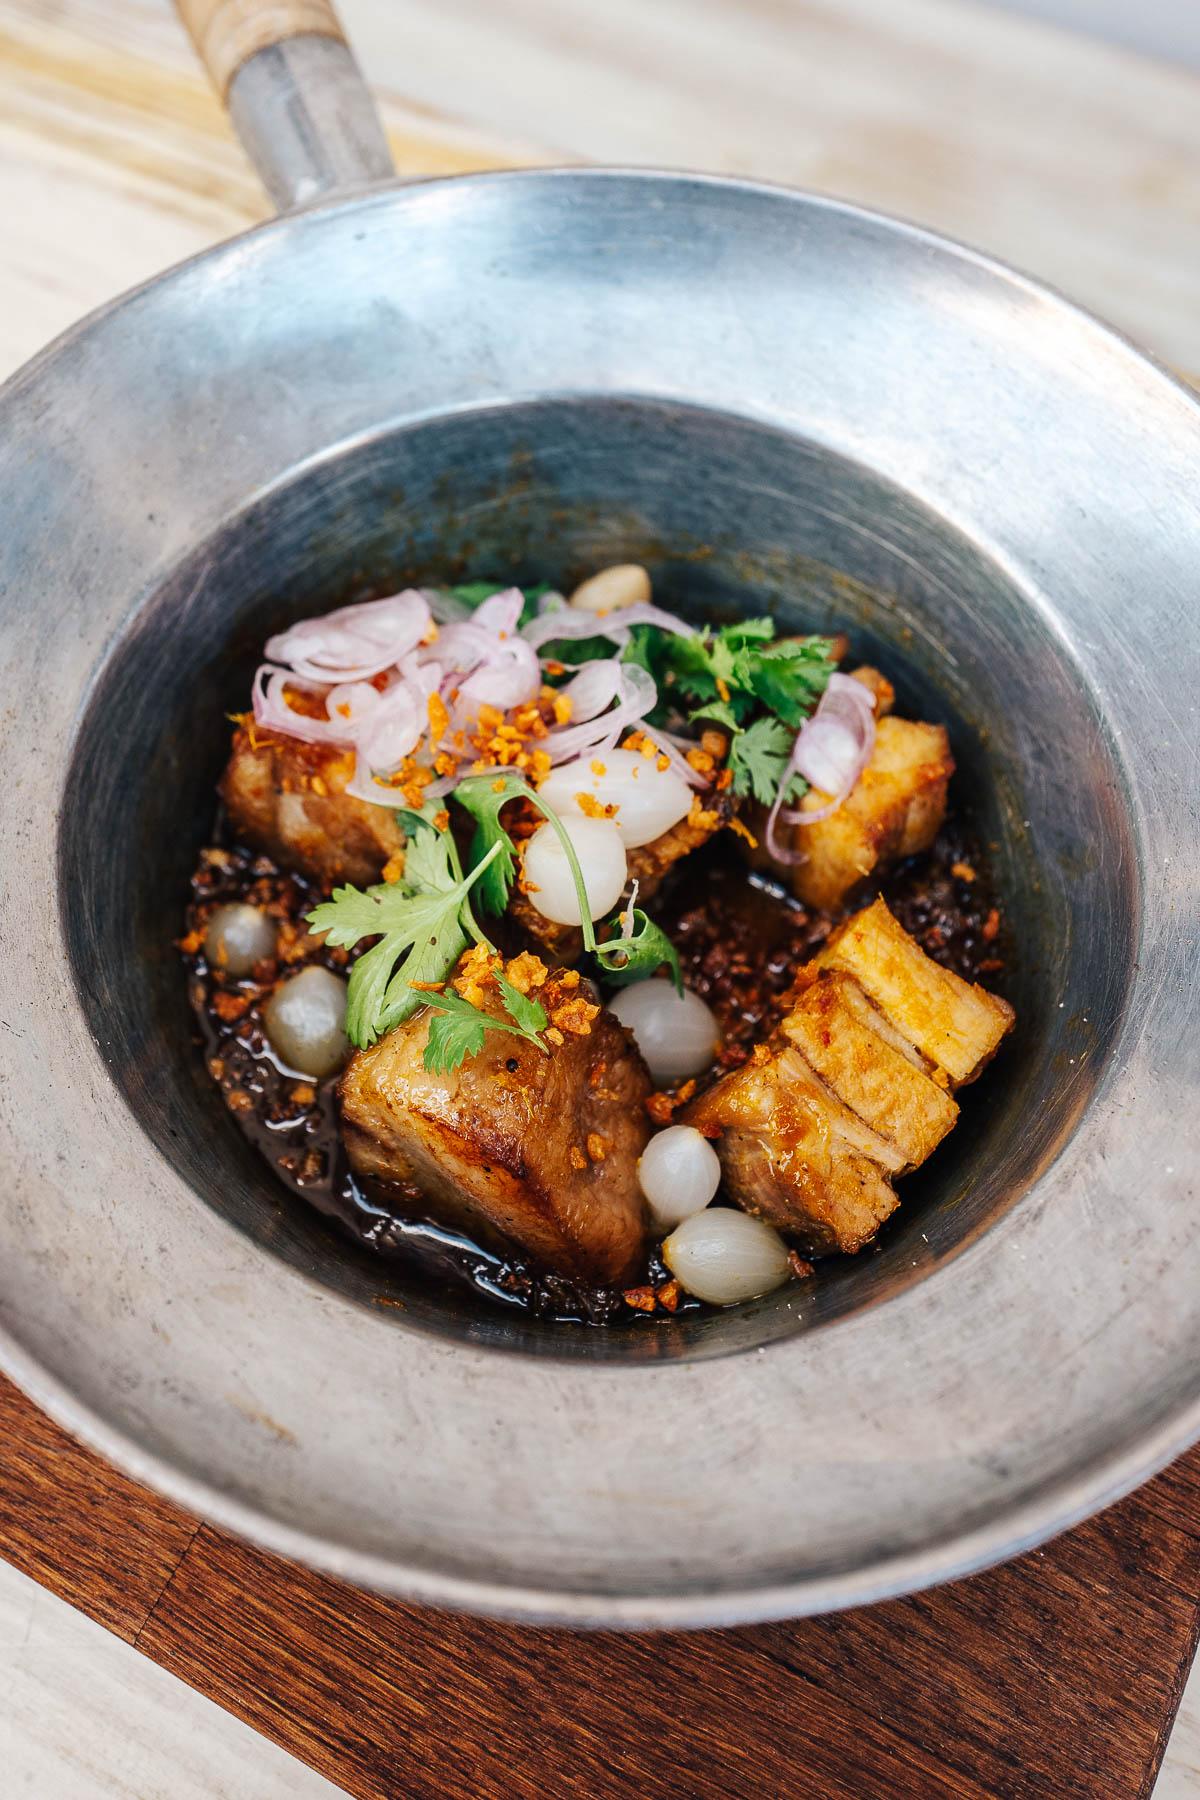 haeng lae curry (แกงฮังเลไต)